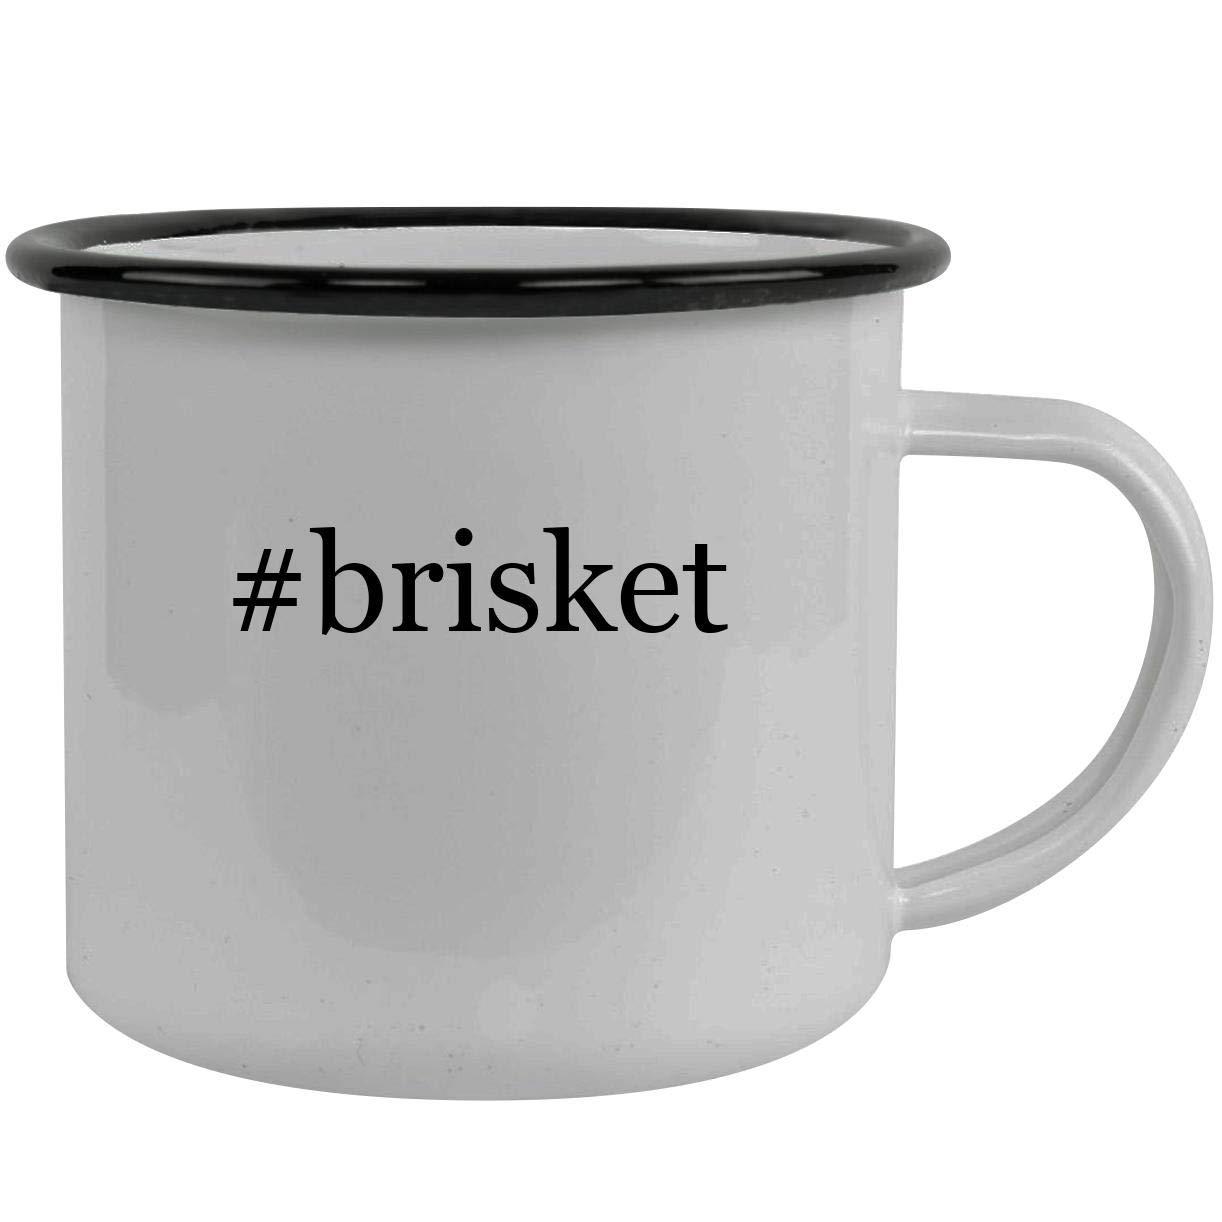 #brisket - Stainless Steel Hashtag 12oz Camping Mug